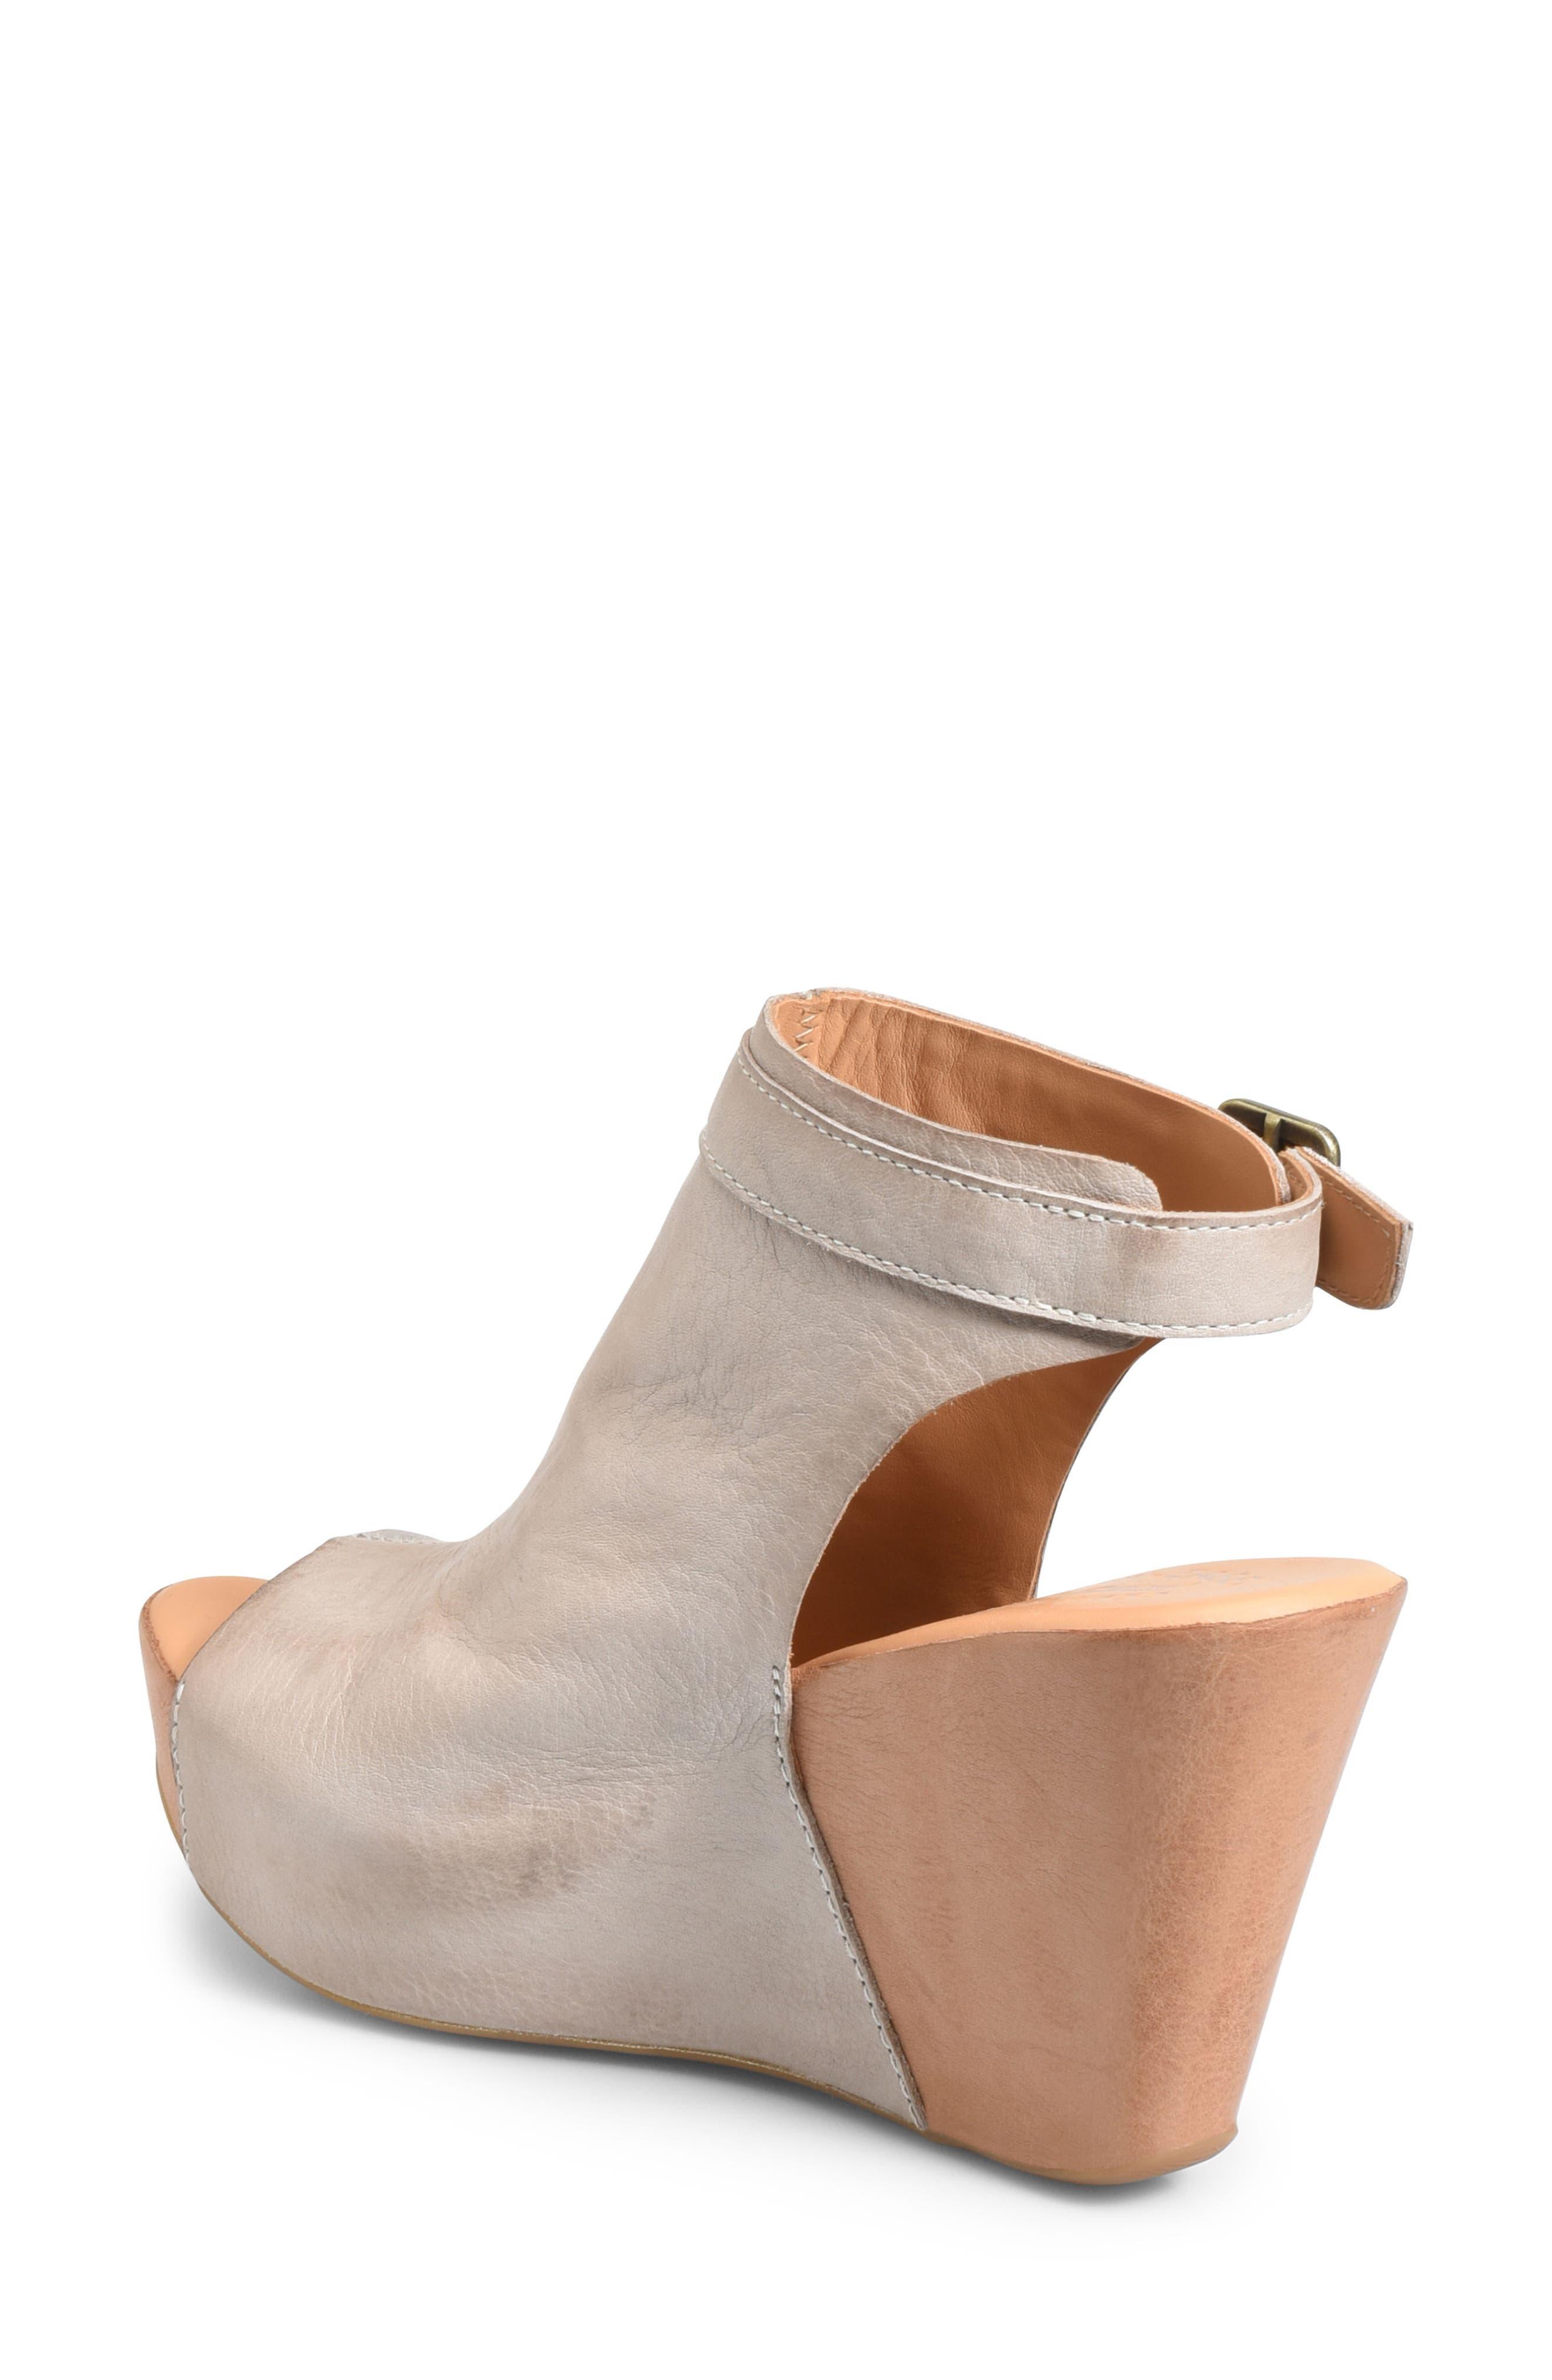 'Berit' Wedge Sandal,                             Alternate thumbnail 24, color,